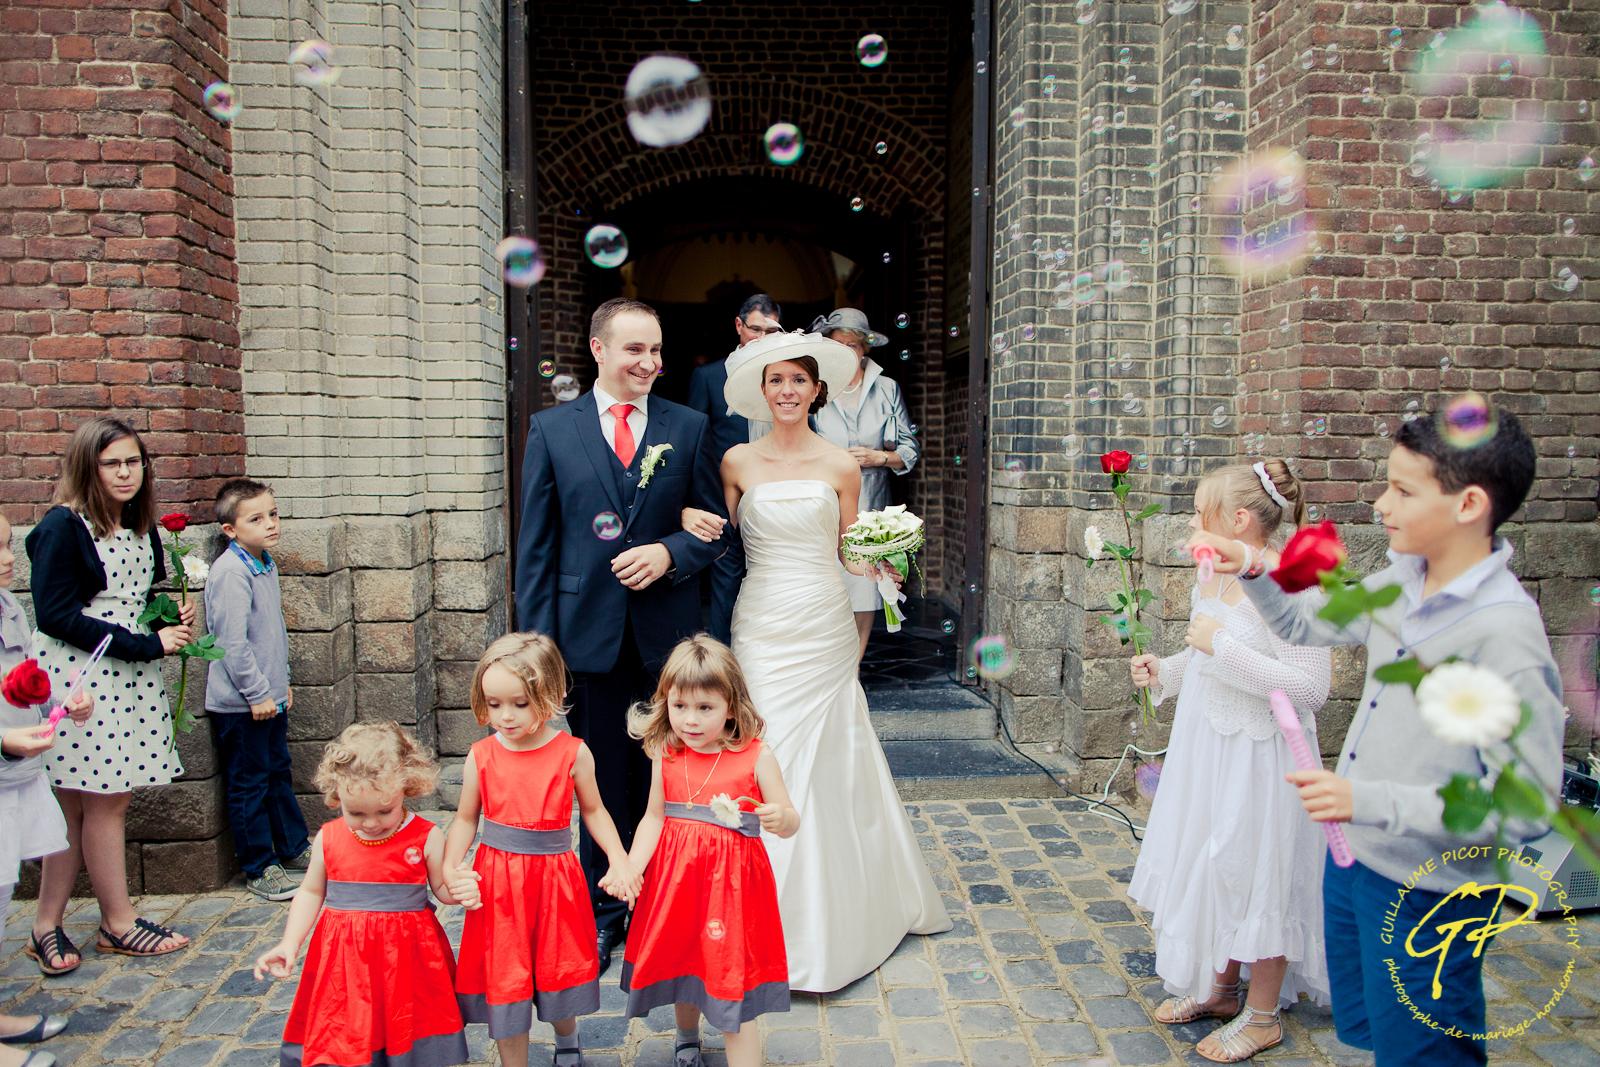 photographe mariage nord (69 sur 96)